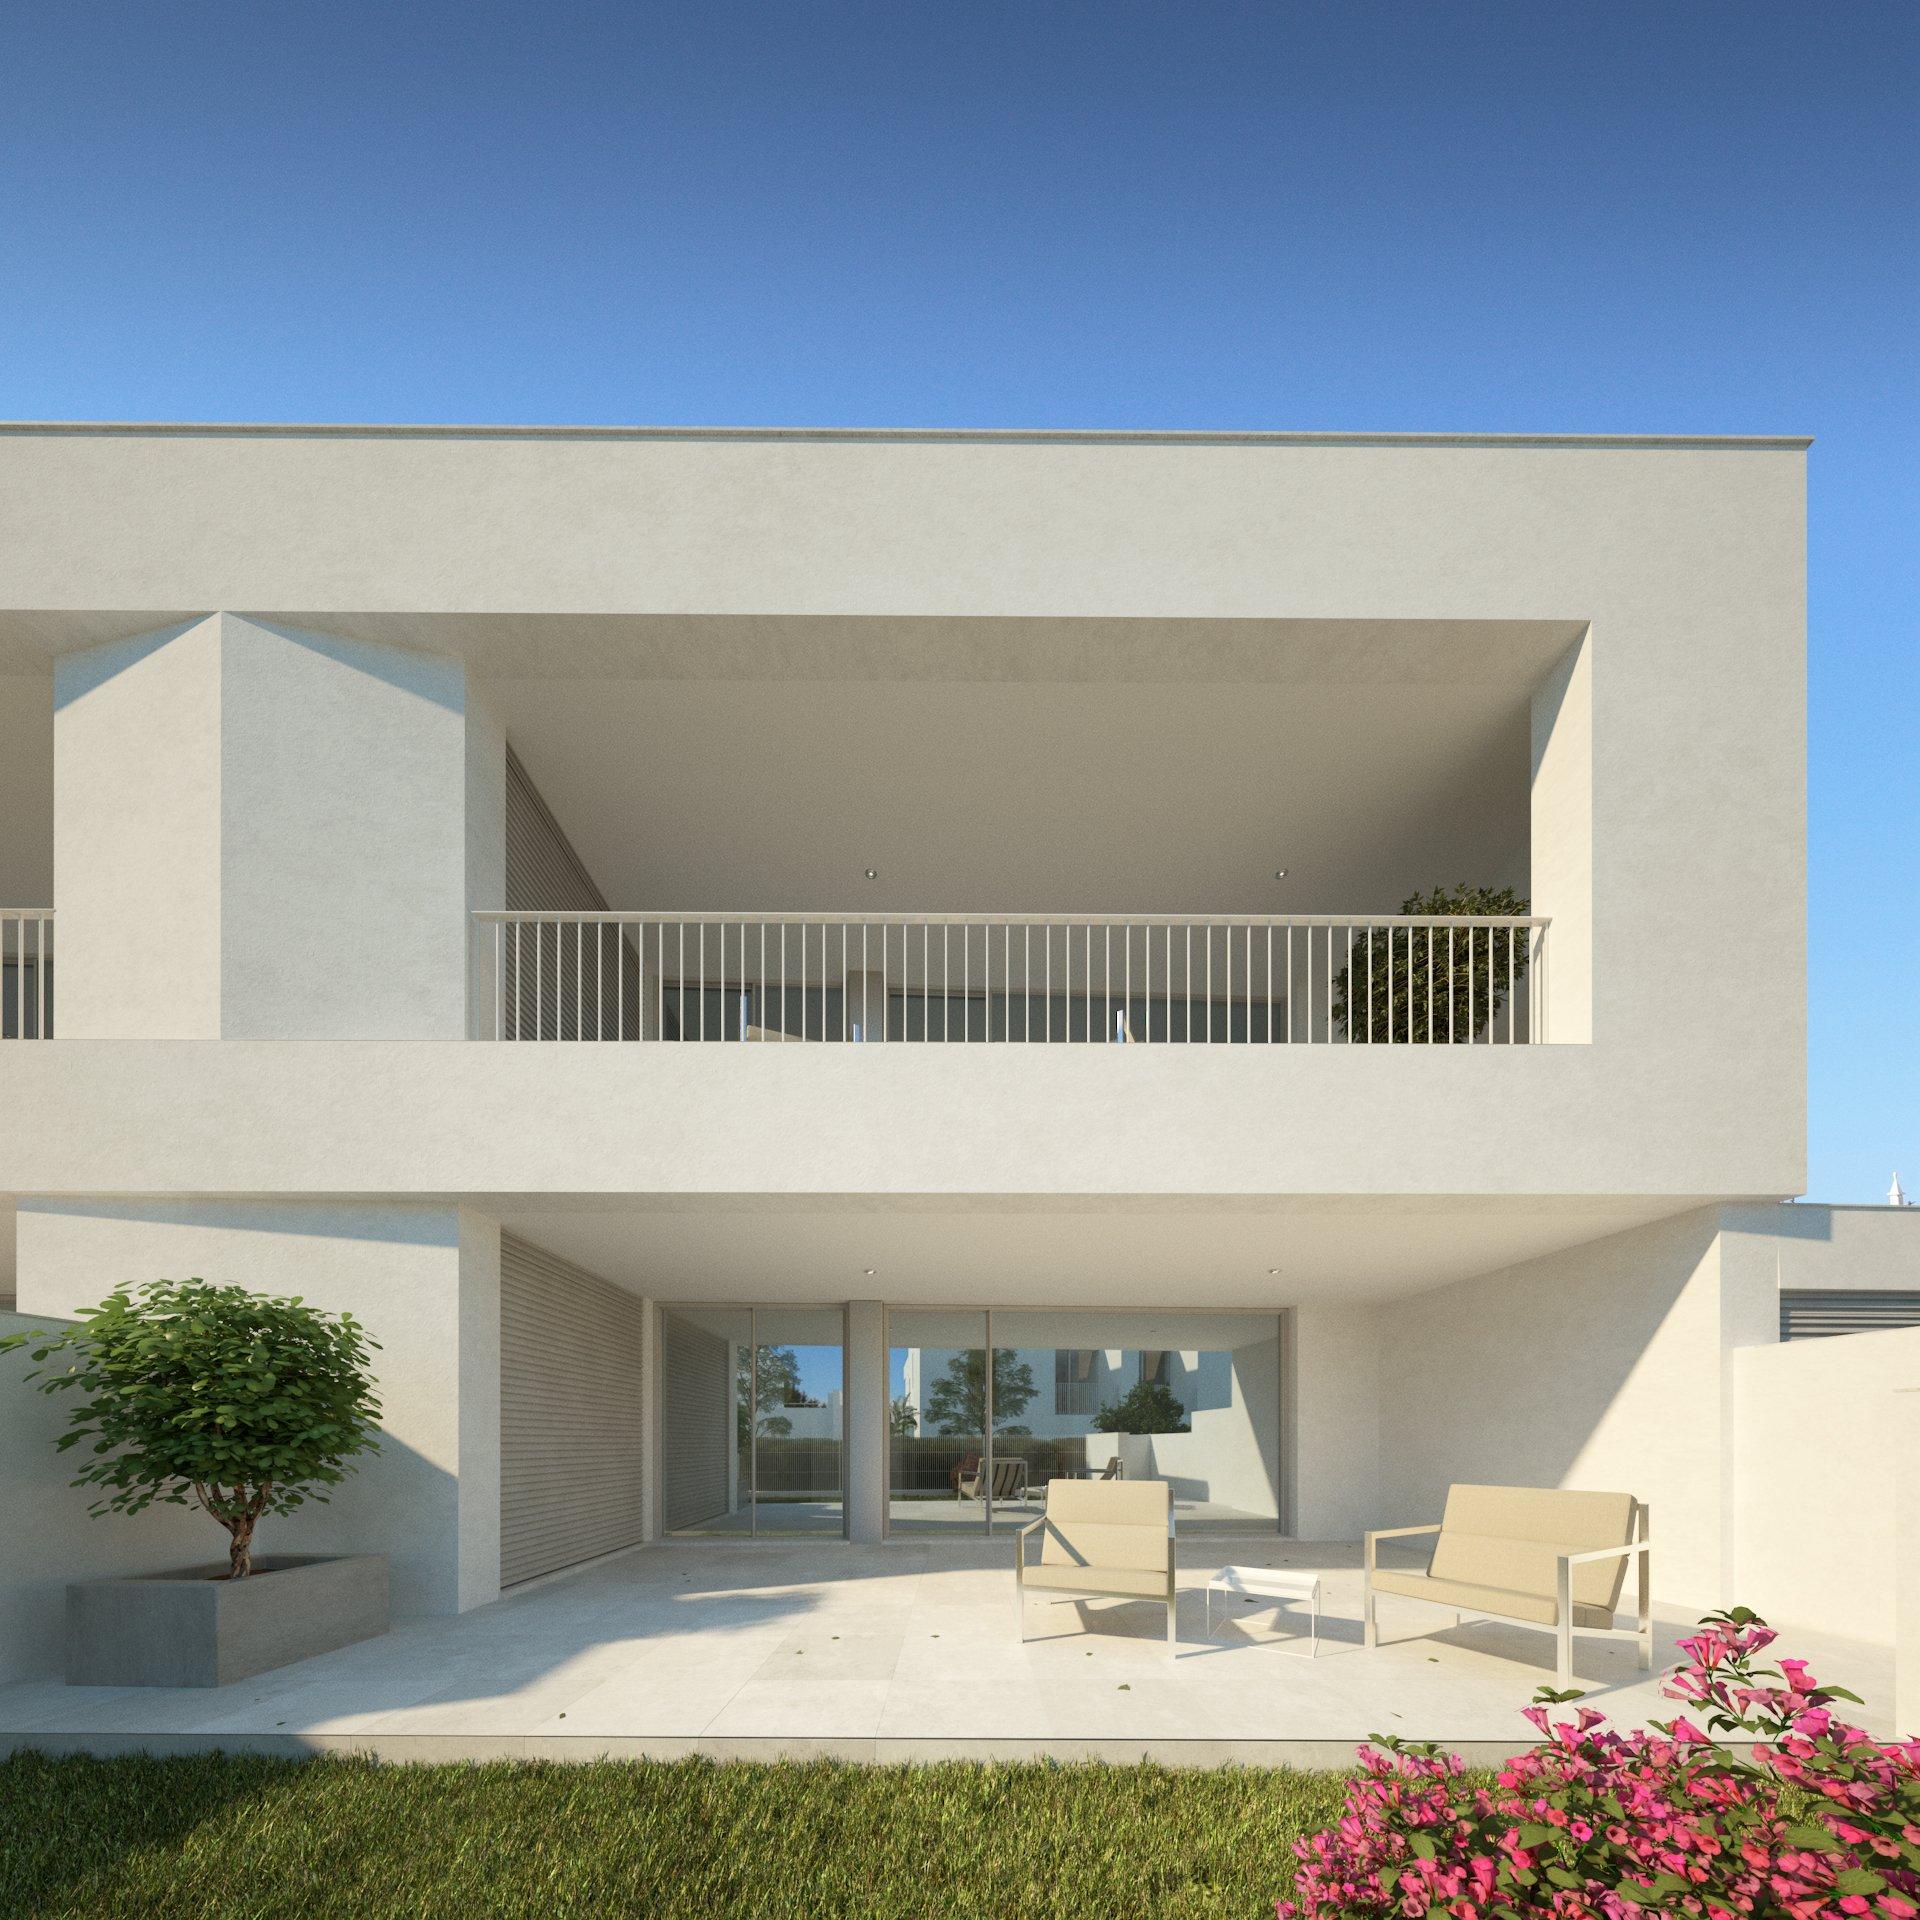 2 Bedroom Apartment Lagos, Western Algarve Ref: GA409C